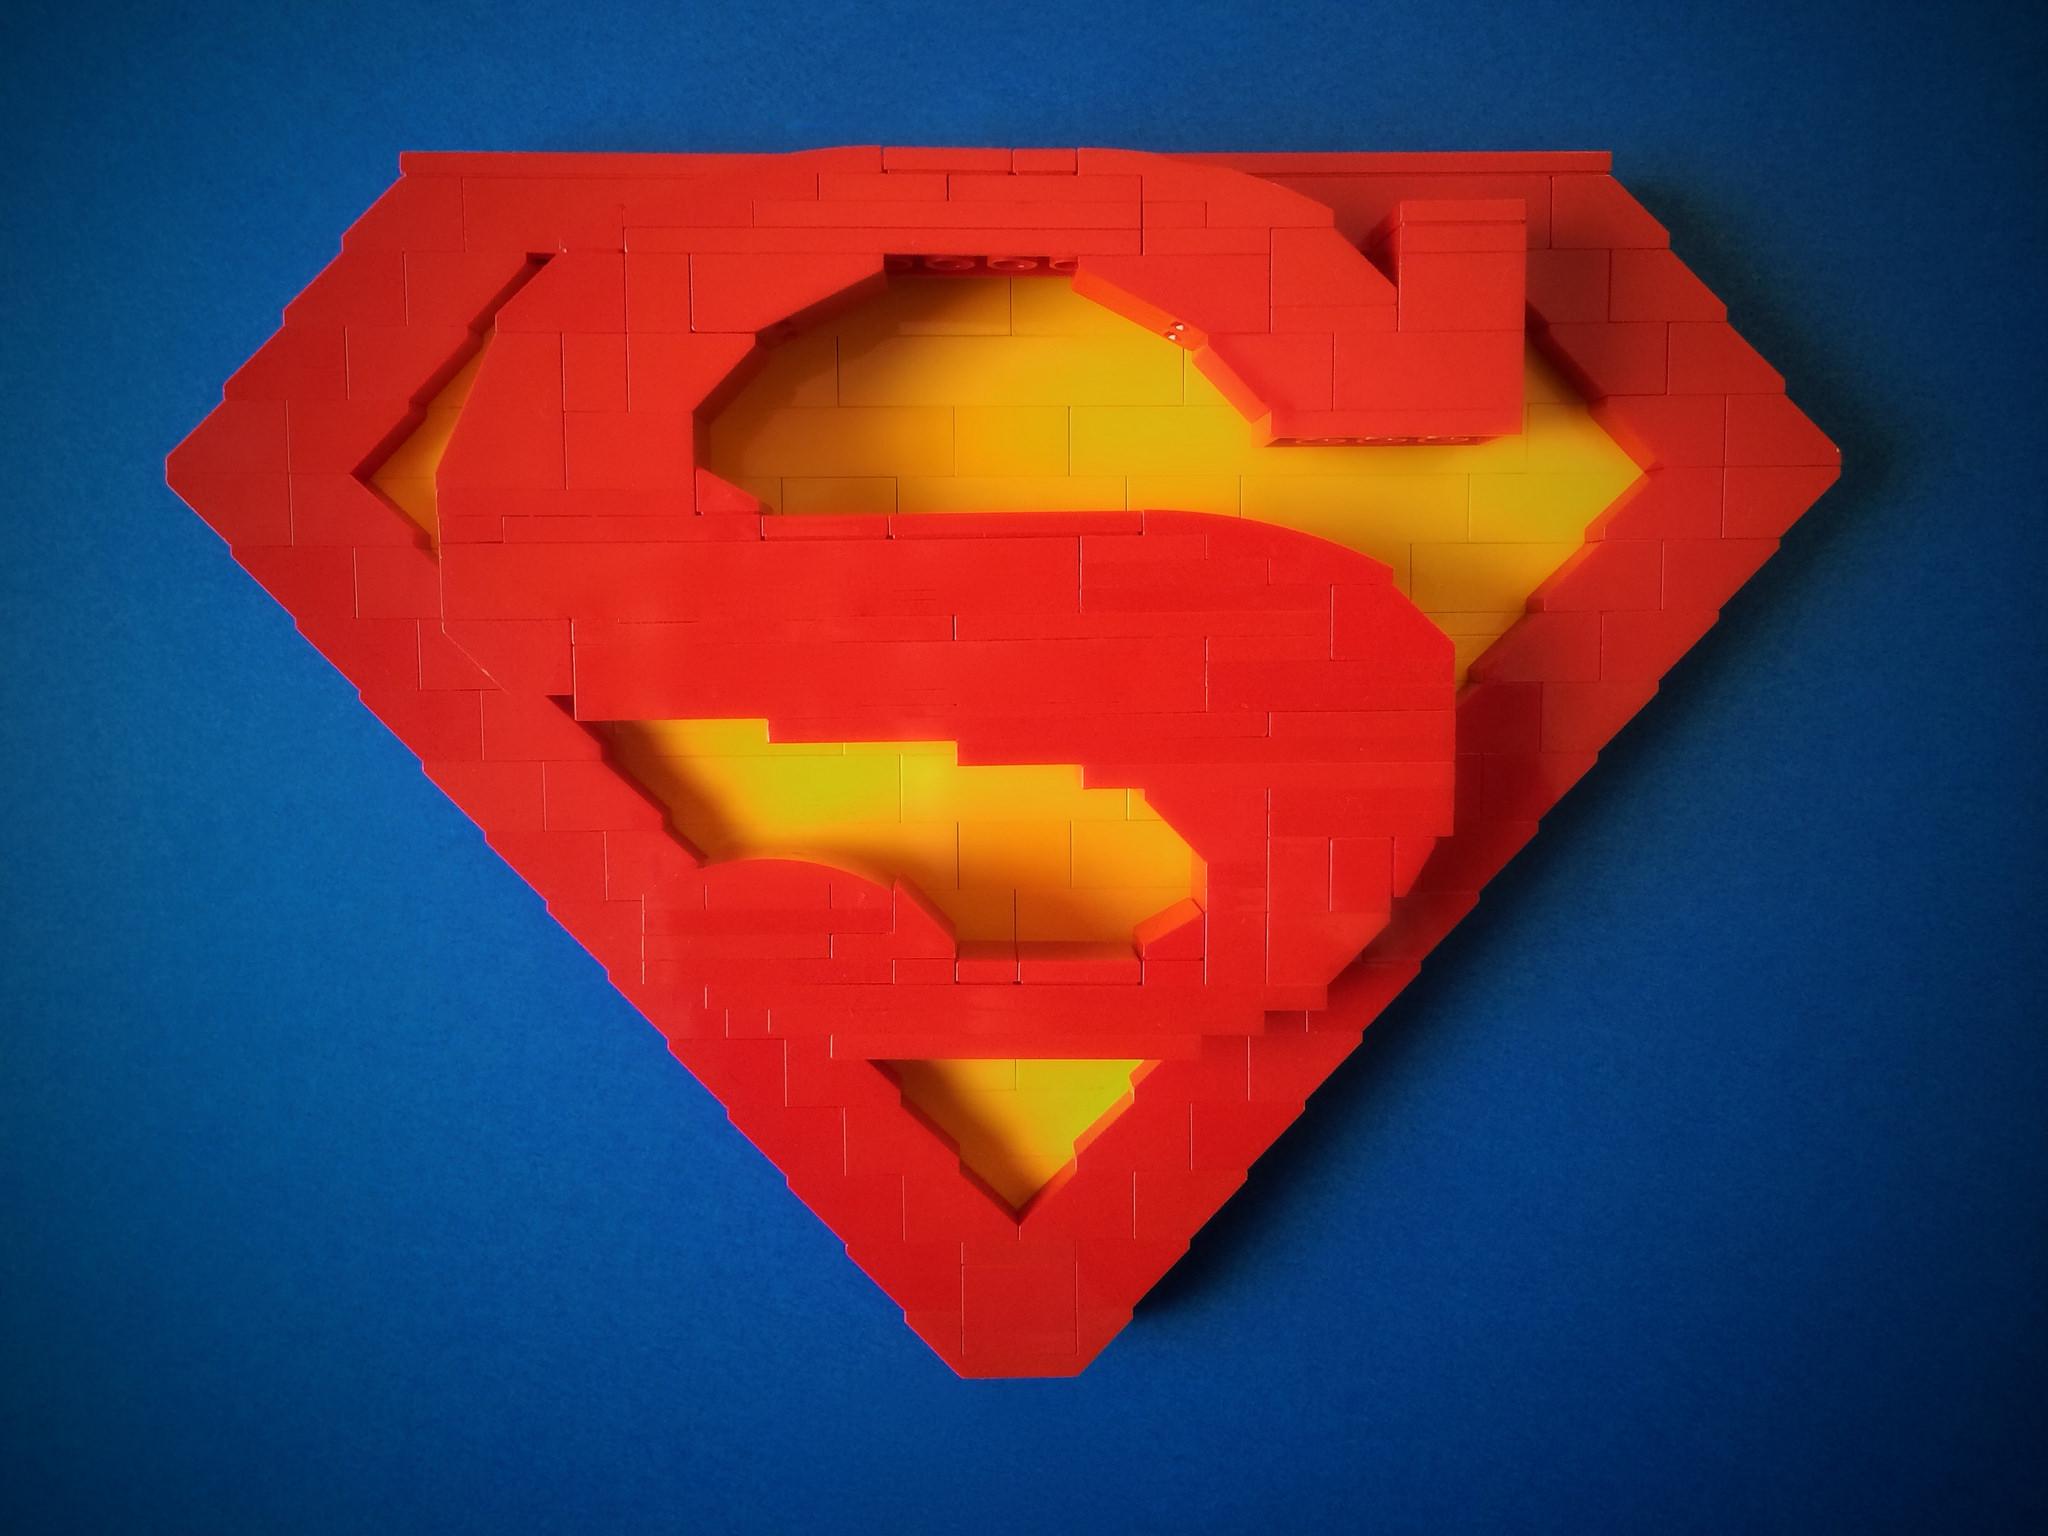 Superman logo with Lego